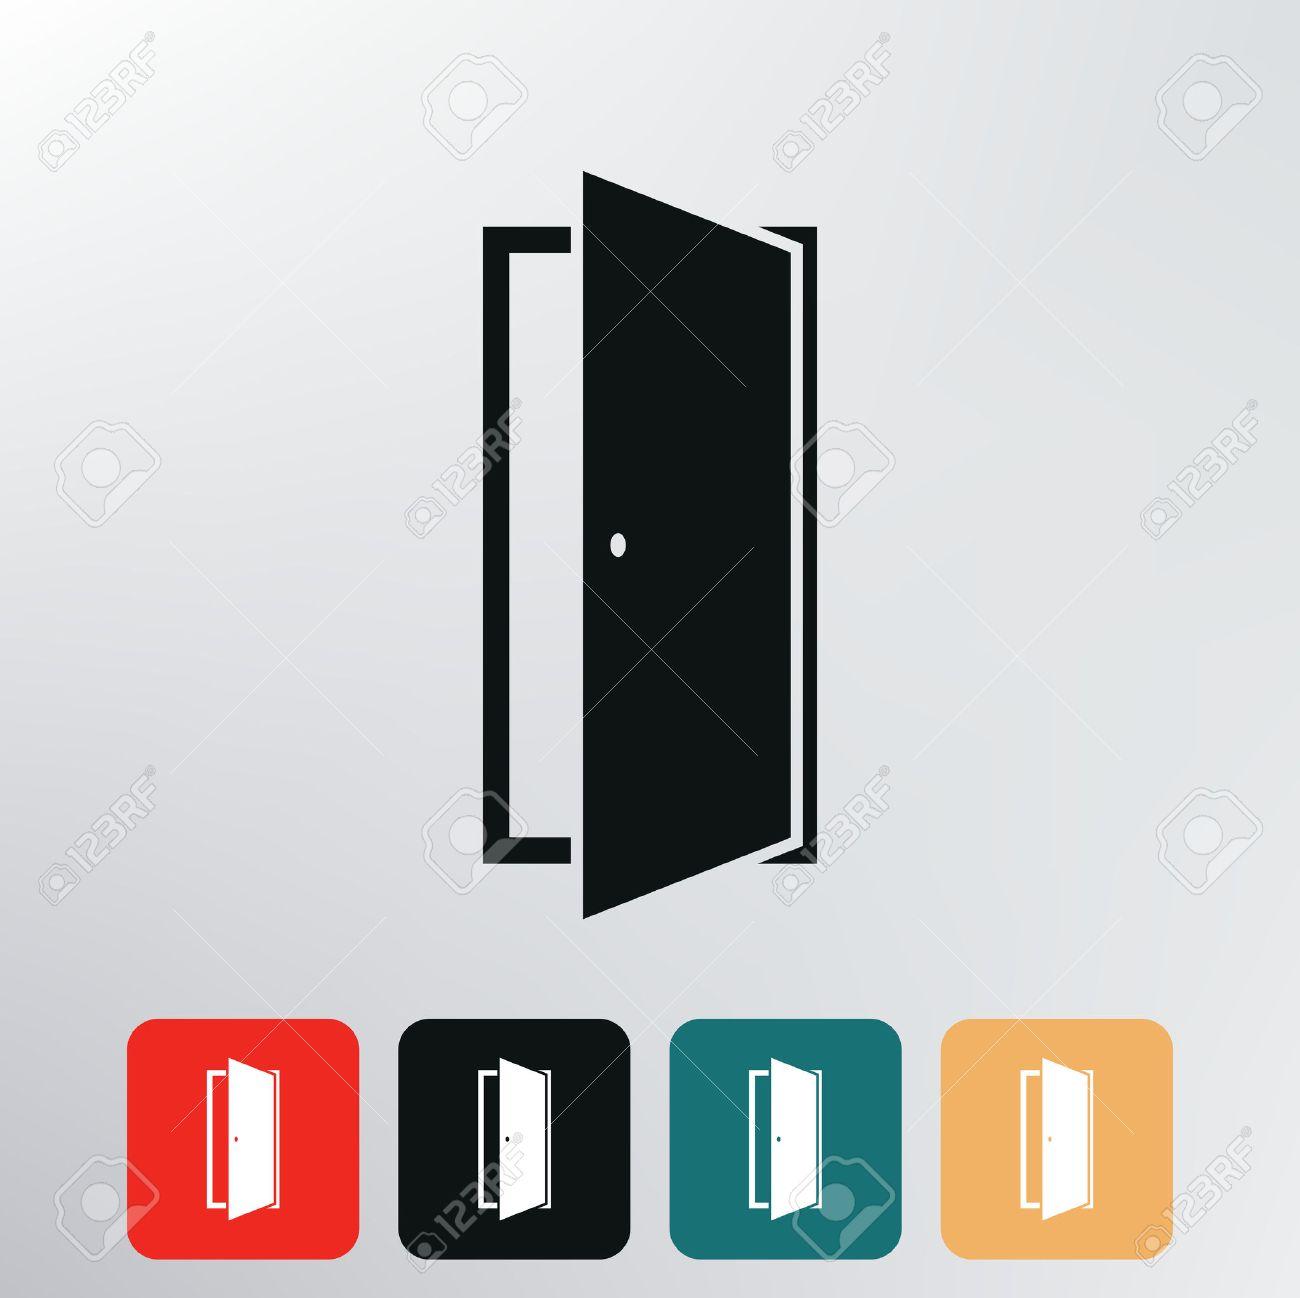 door icon Stock Vector - 29225561  sc 1 st  123RF Stock Photos & Door Icon Royalty Free Cliparts Vectors And Stock Illustration ... pezcame.com